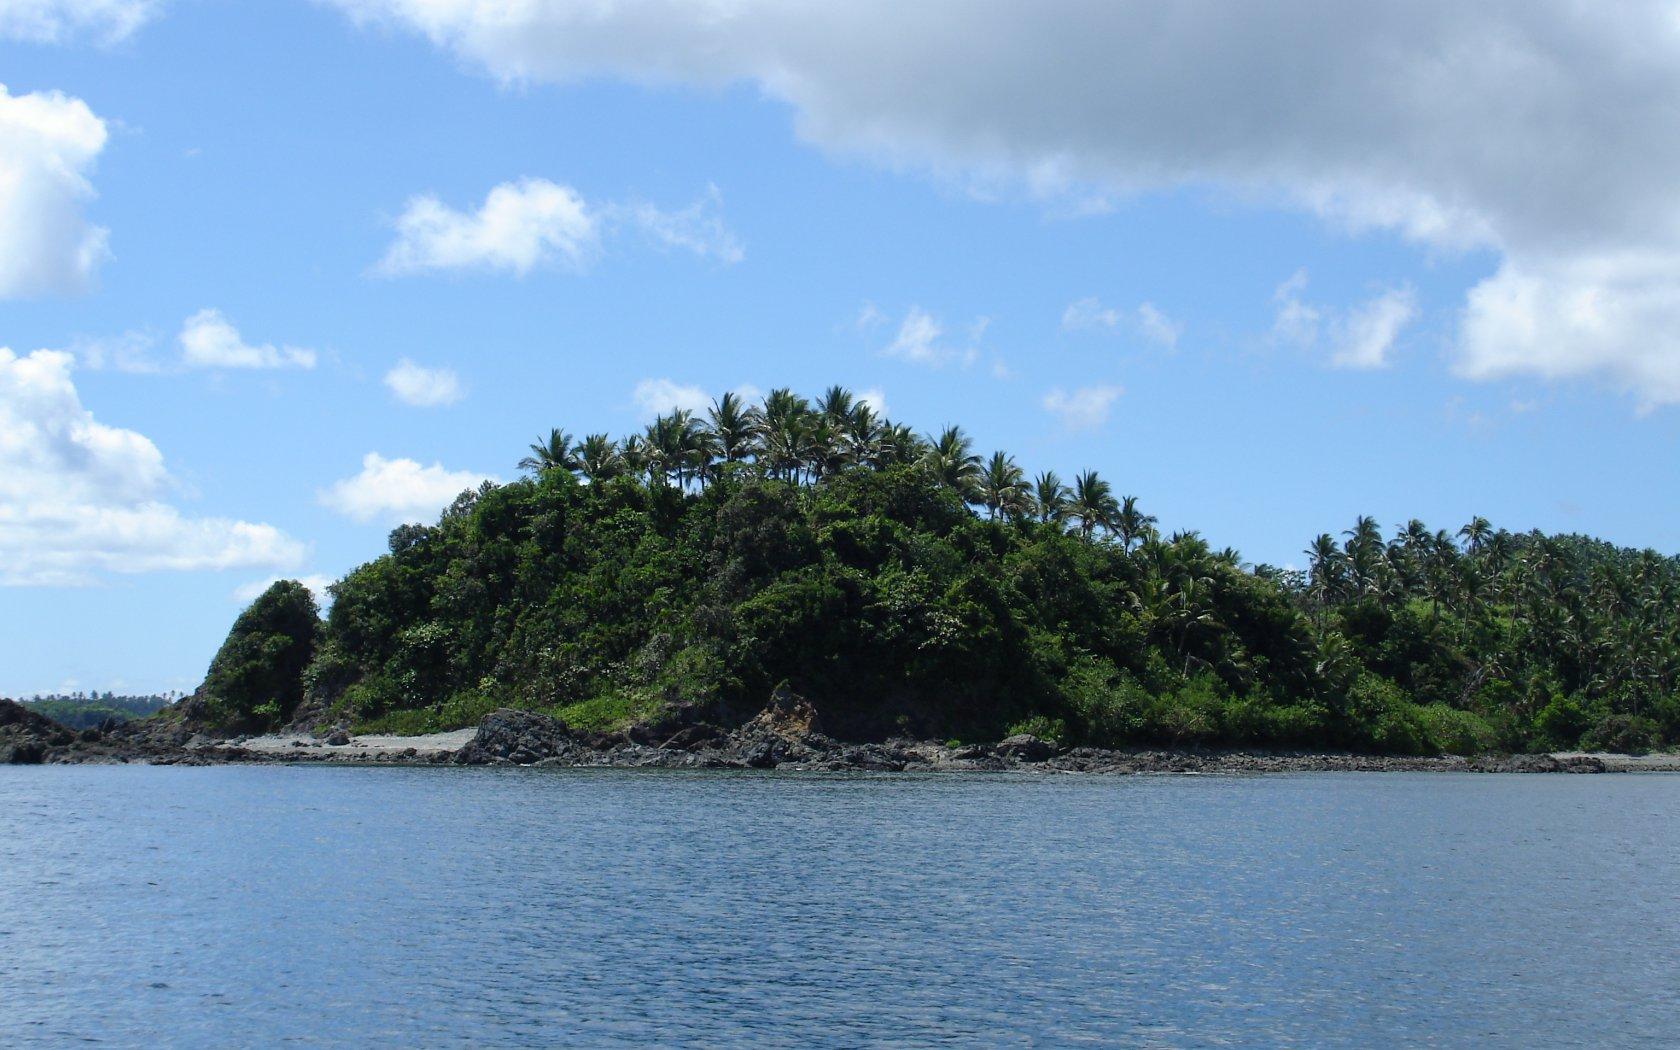 island nature scenery photos   widescreen desktop background 1680x1050